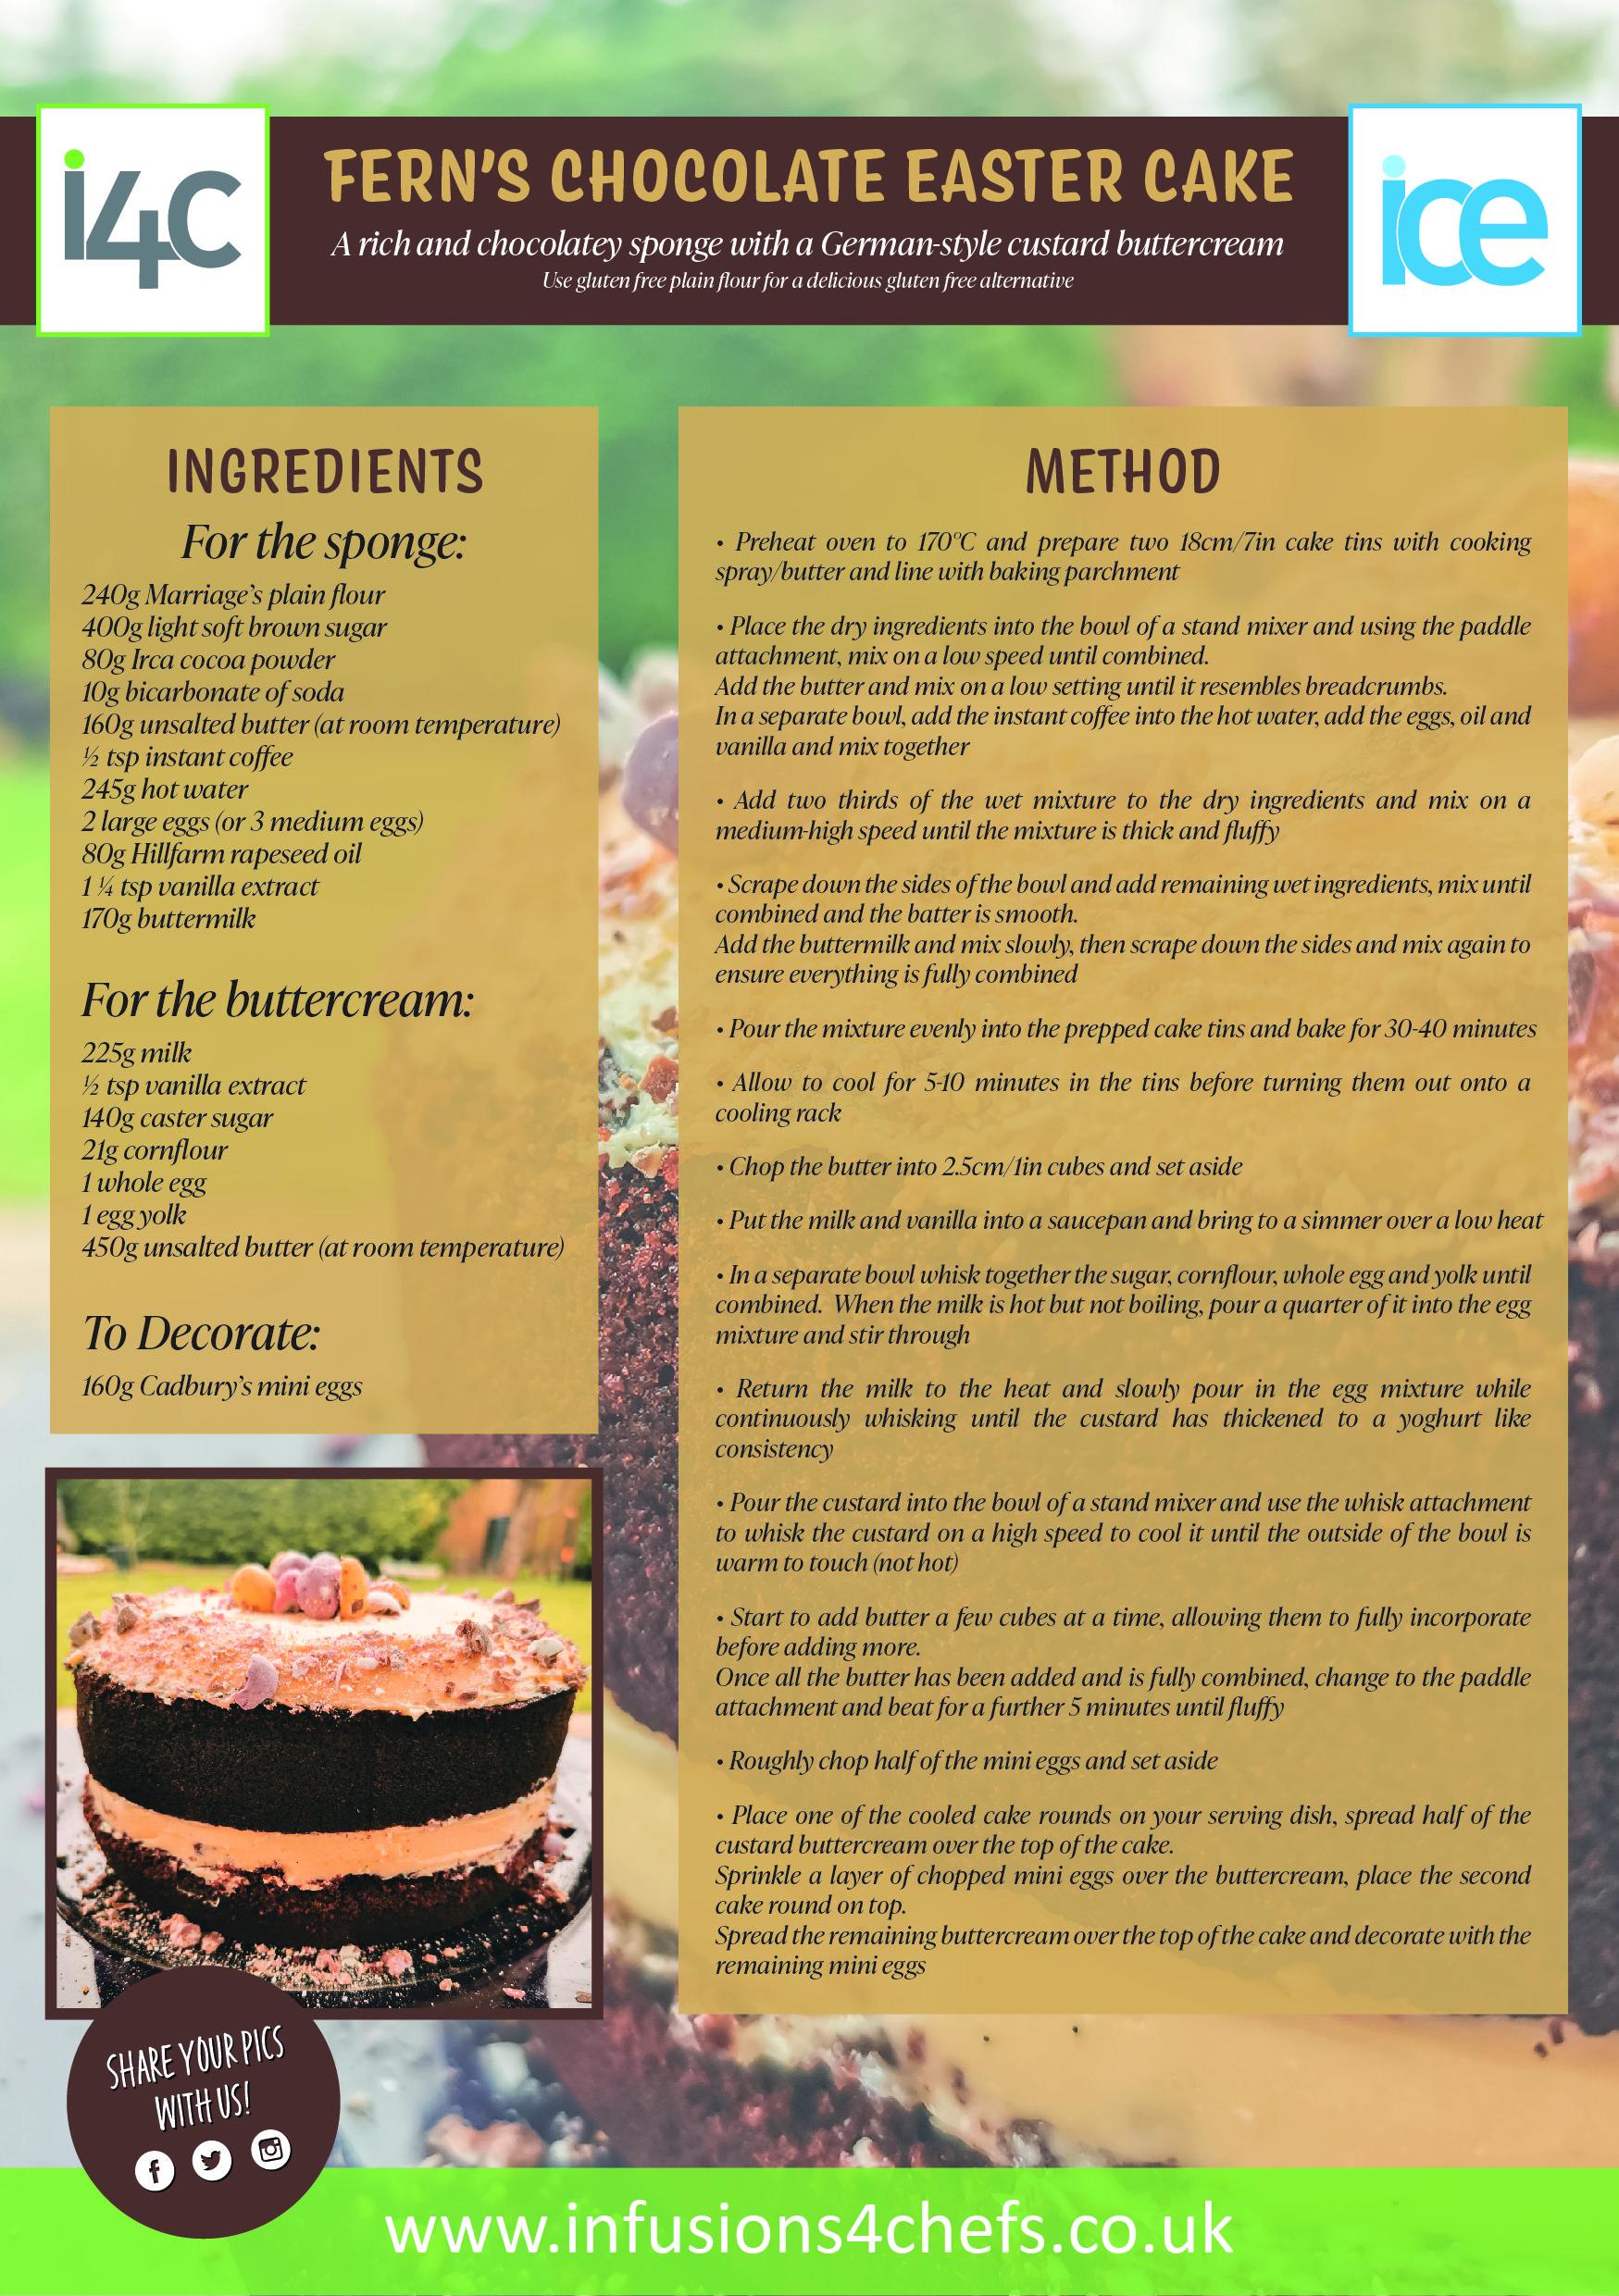 i4c-choc-easter-cake-recipe-01.jpg